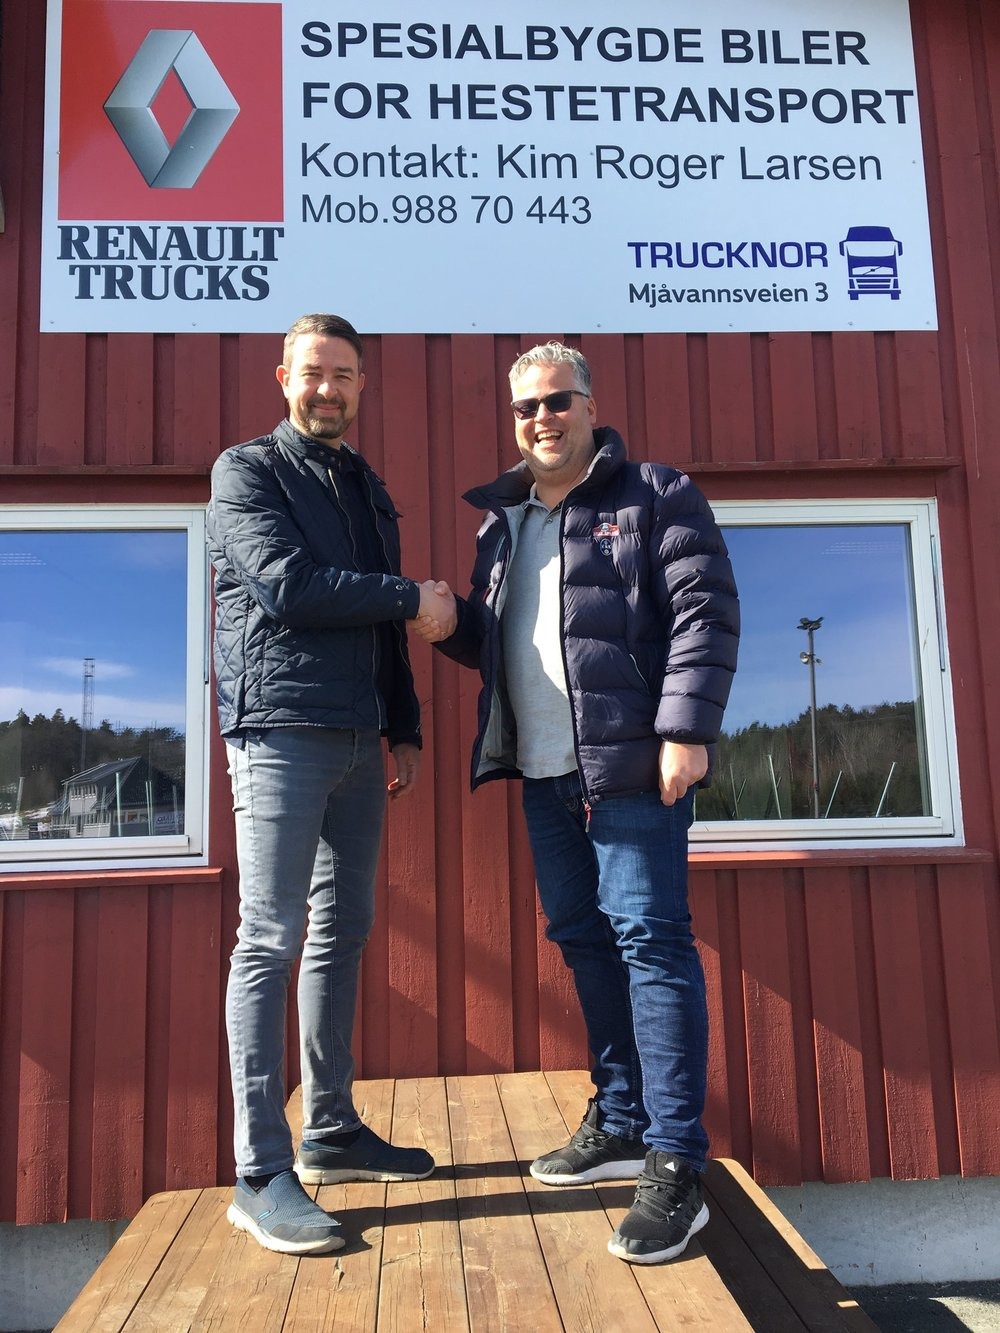 Kim Roger Larsen (t.v.) og markedssjef Ingvar Ludvigsen ser frem til videre samarbeid mellom Sørlandets Travpark og Trucknor. Foto: Richard Ekhaugen.